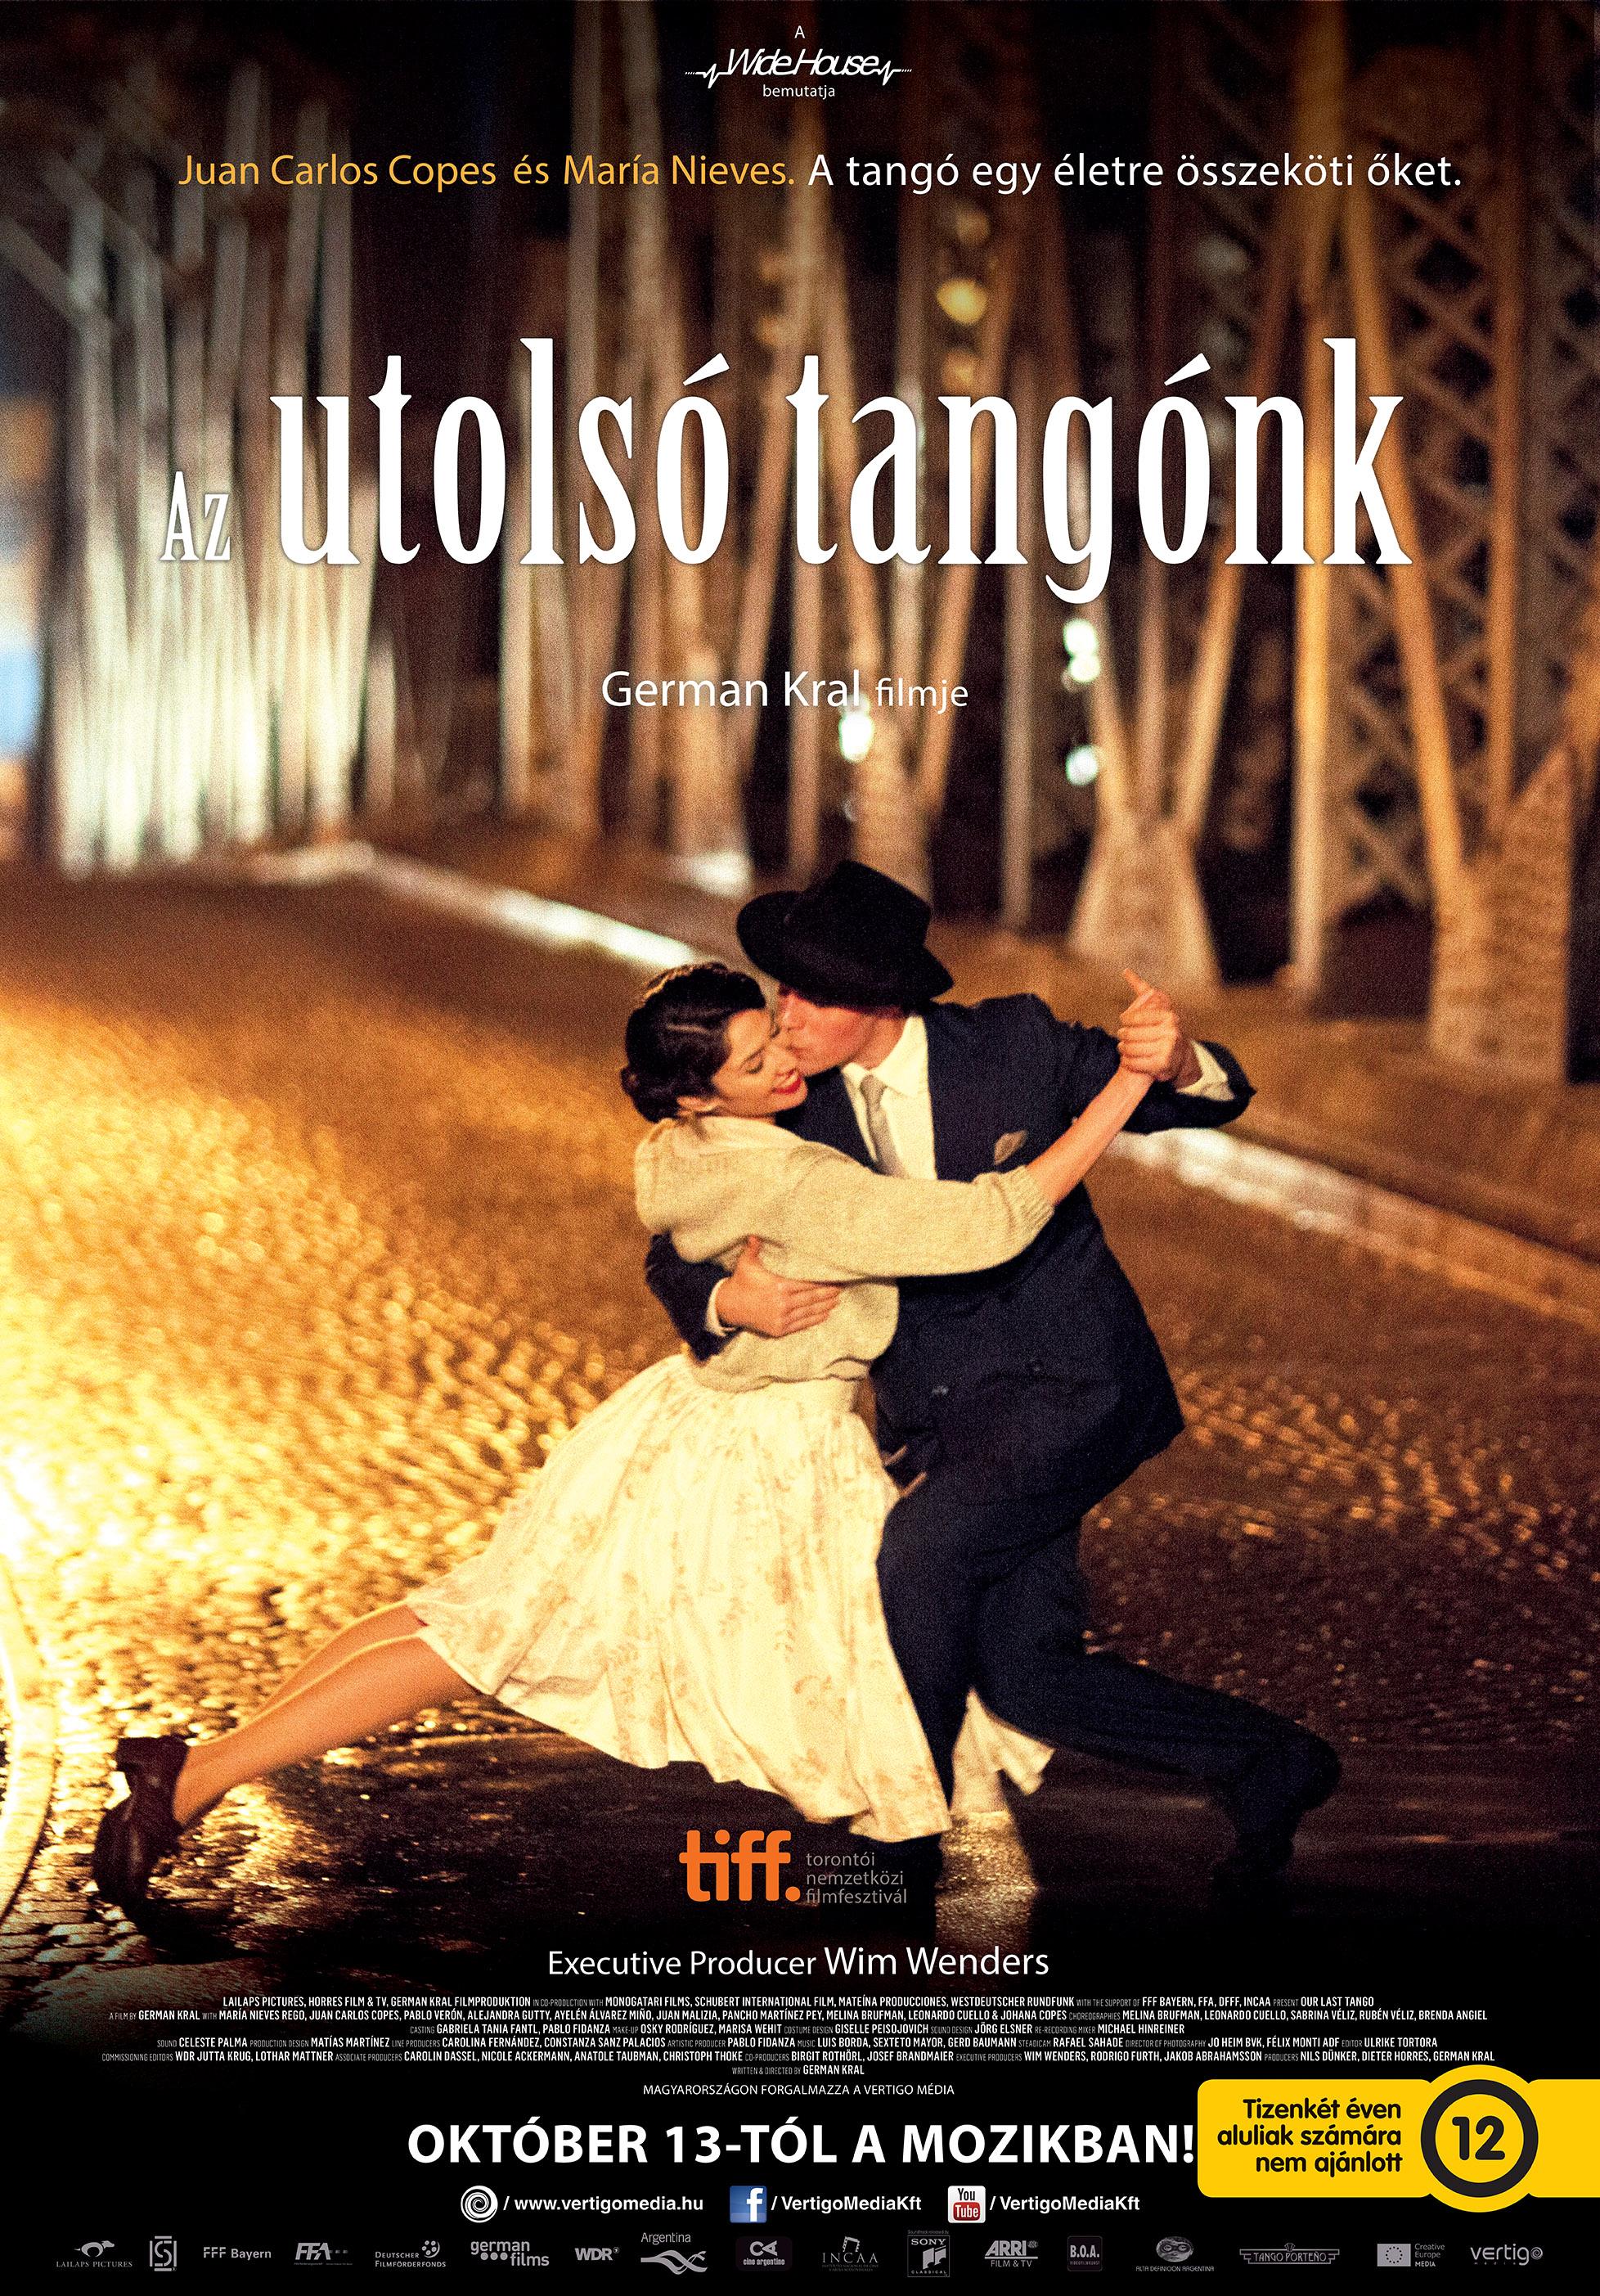 az_utolso_tangonk_plakat.jpg